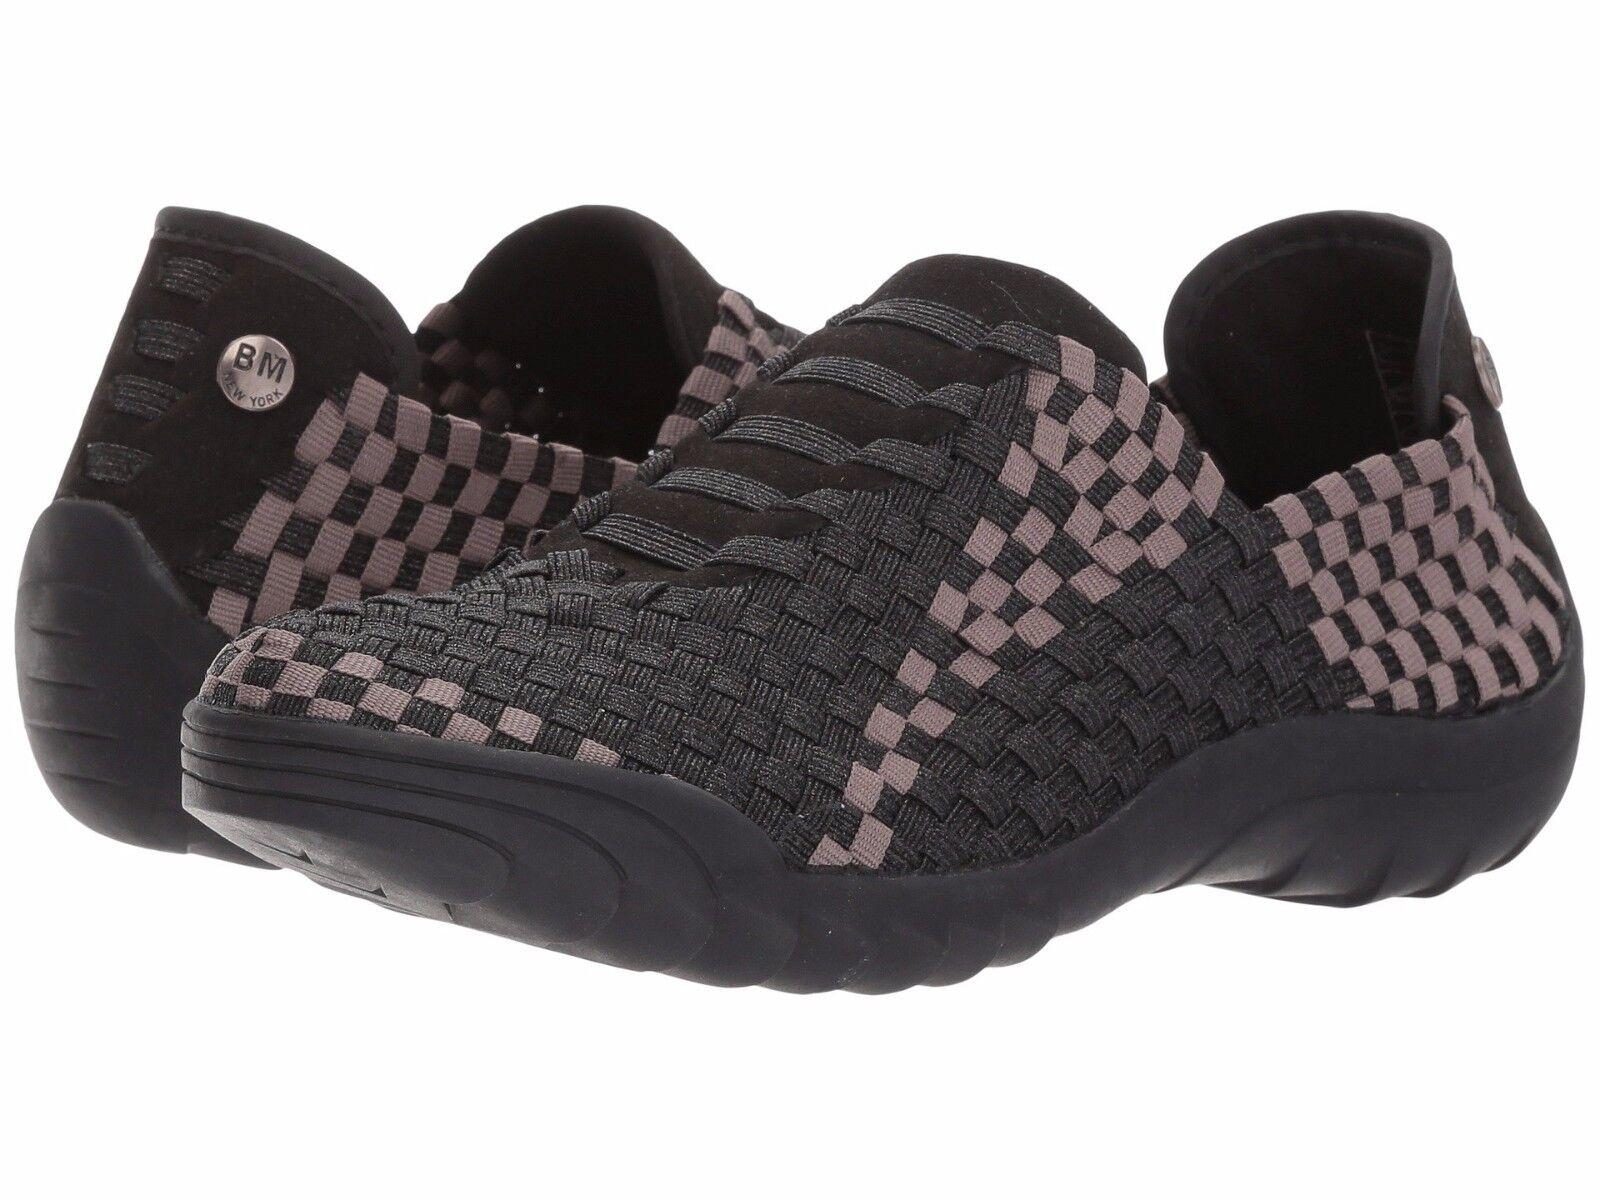 Bernie Mev Mev Mev Women's Rigged Vivaldi Woven Slip On Sneakers Black Smoke Sizes 36-39 f3b3df